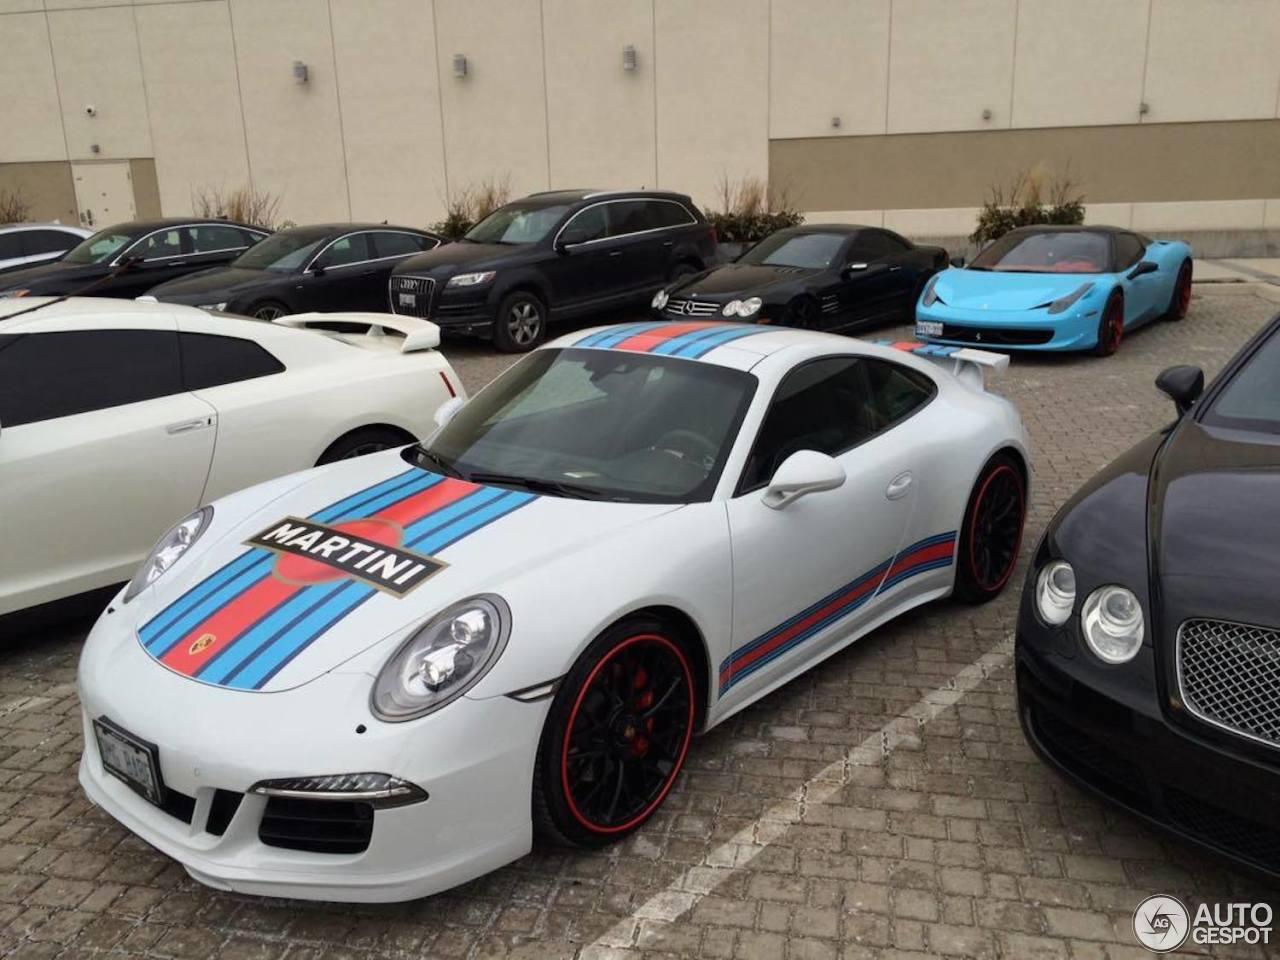 Porsche 991 Carrera Gts Martini Racing Edition 26